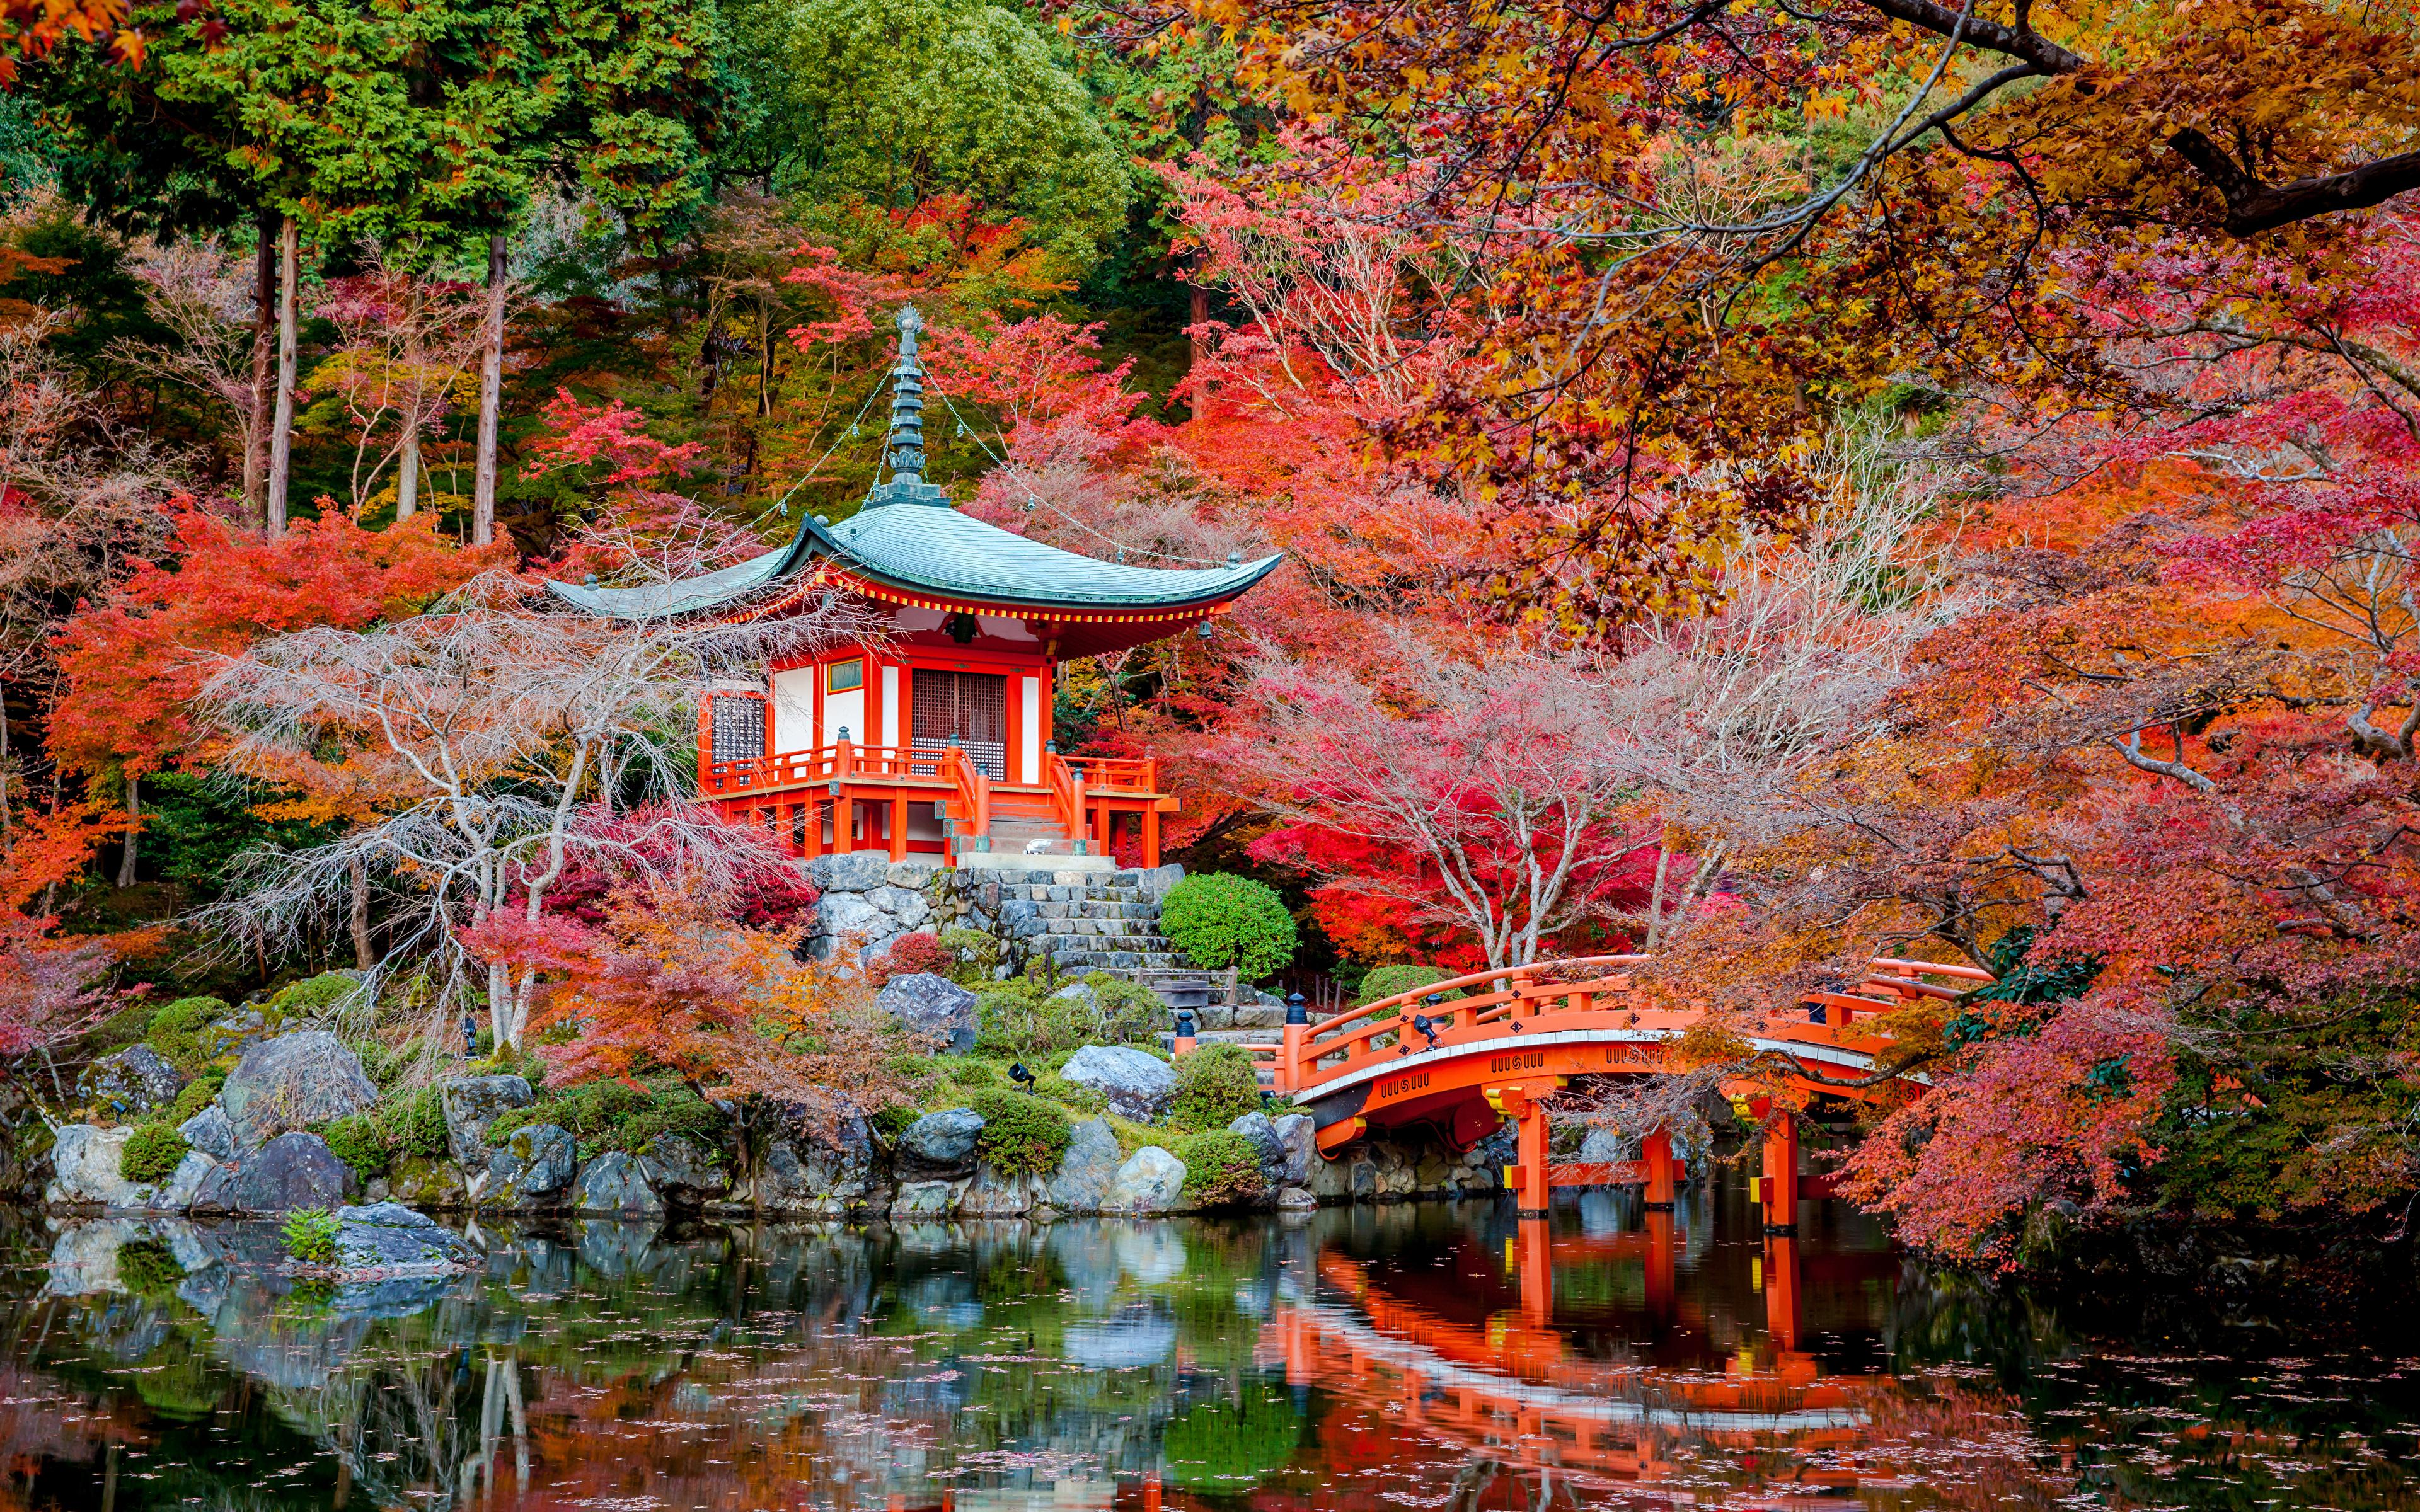 Desktop Wallpapers Kyoto Japan Autumn Nature Bridges Pond Parks Pagodas Trees 3840x2400 bridge park